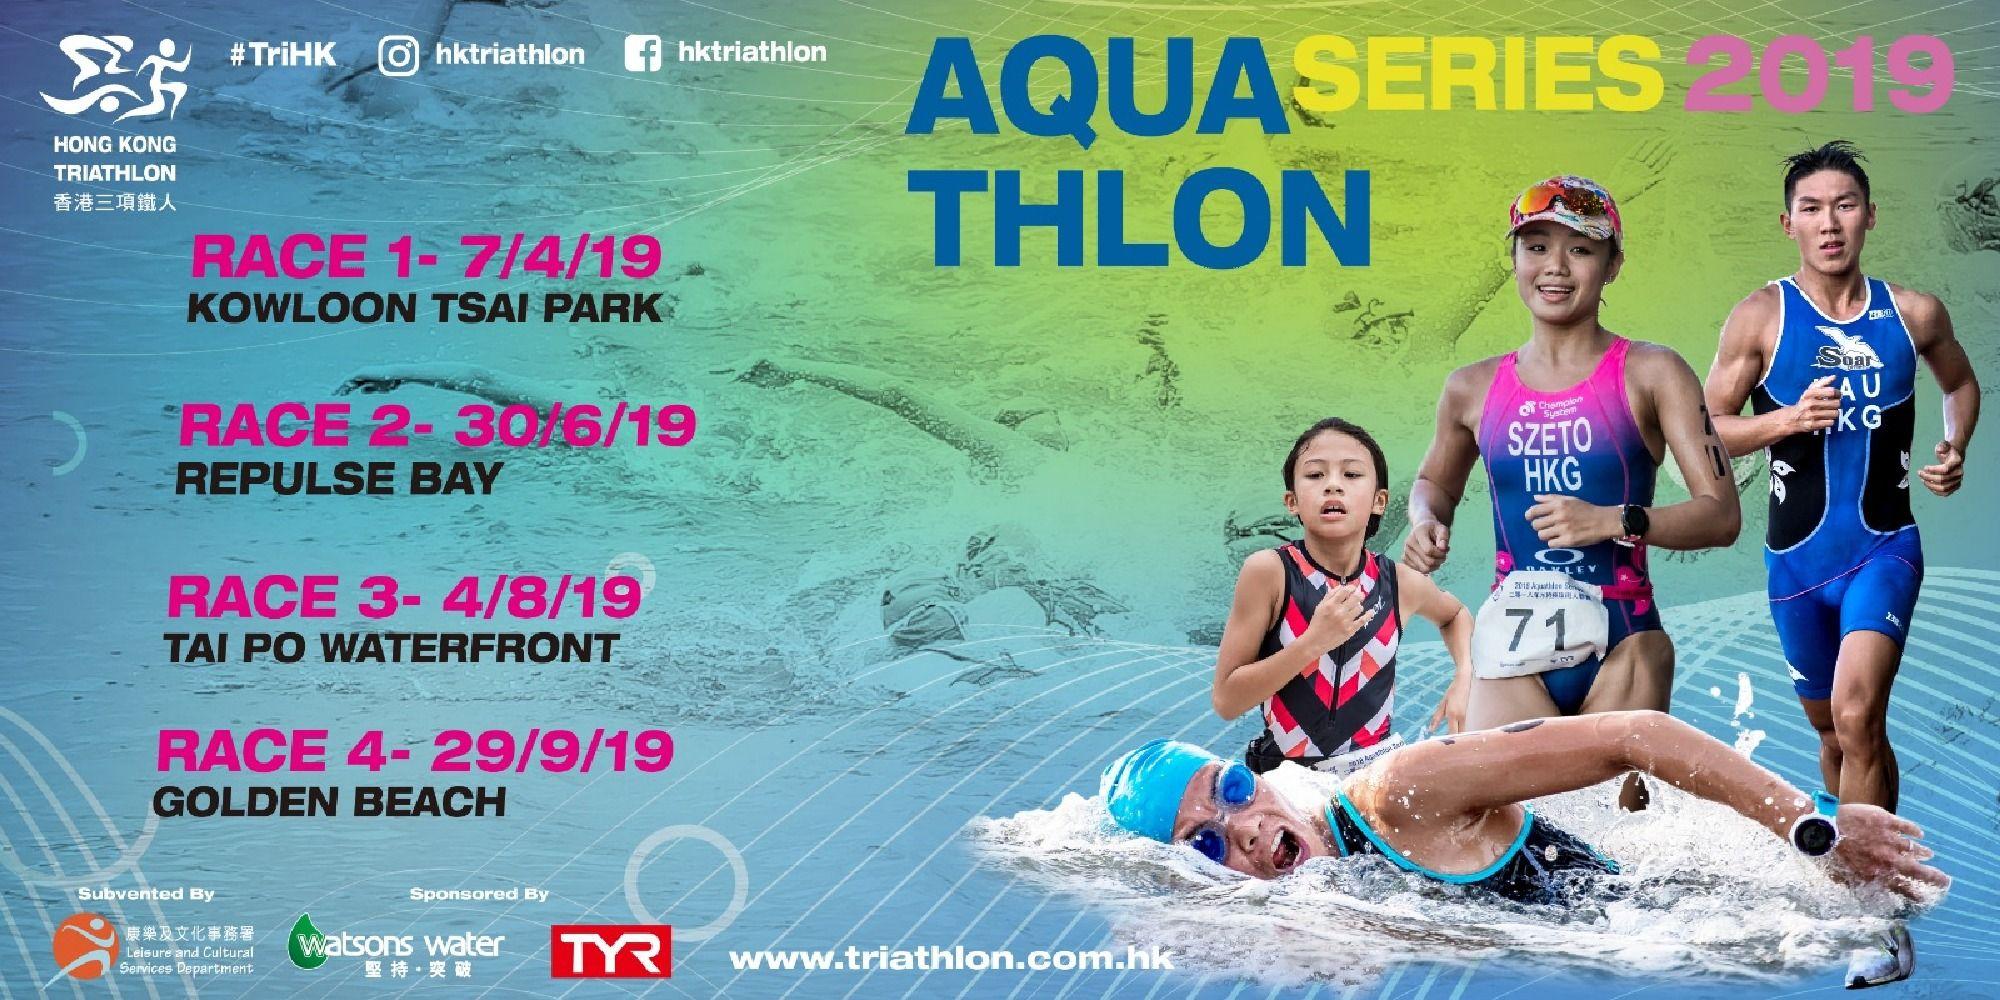 2019 Aquathlon Series – Race 3 二零一九年水陸兩項鐵人賽 - 比賽3